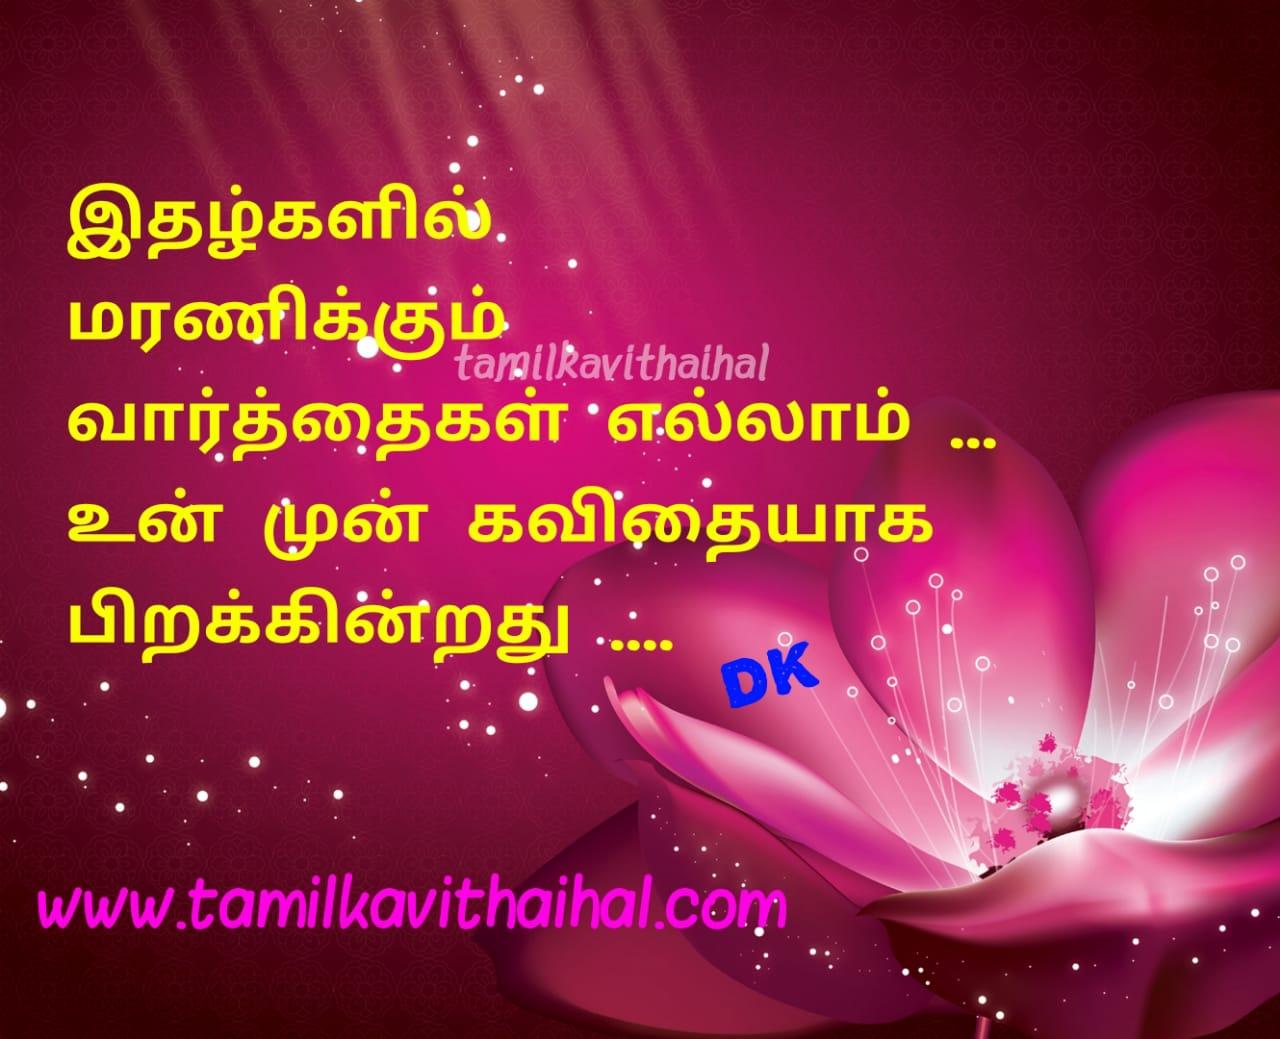 Beautyful tamil kadhalkavithaigal romantictamil tajmahal symboloflove aalamaana tamilkavithaigal